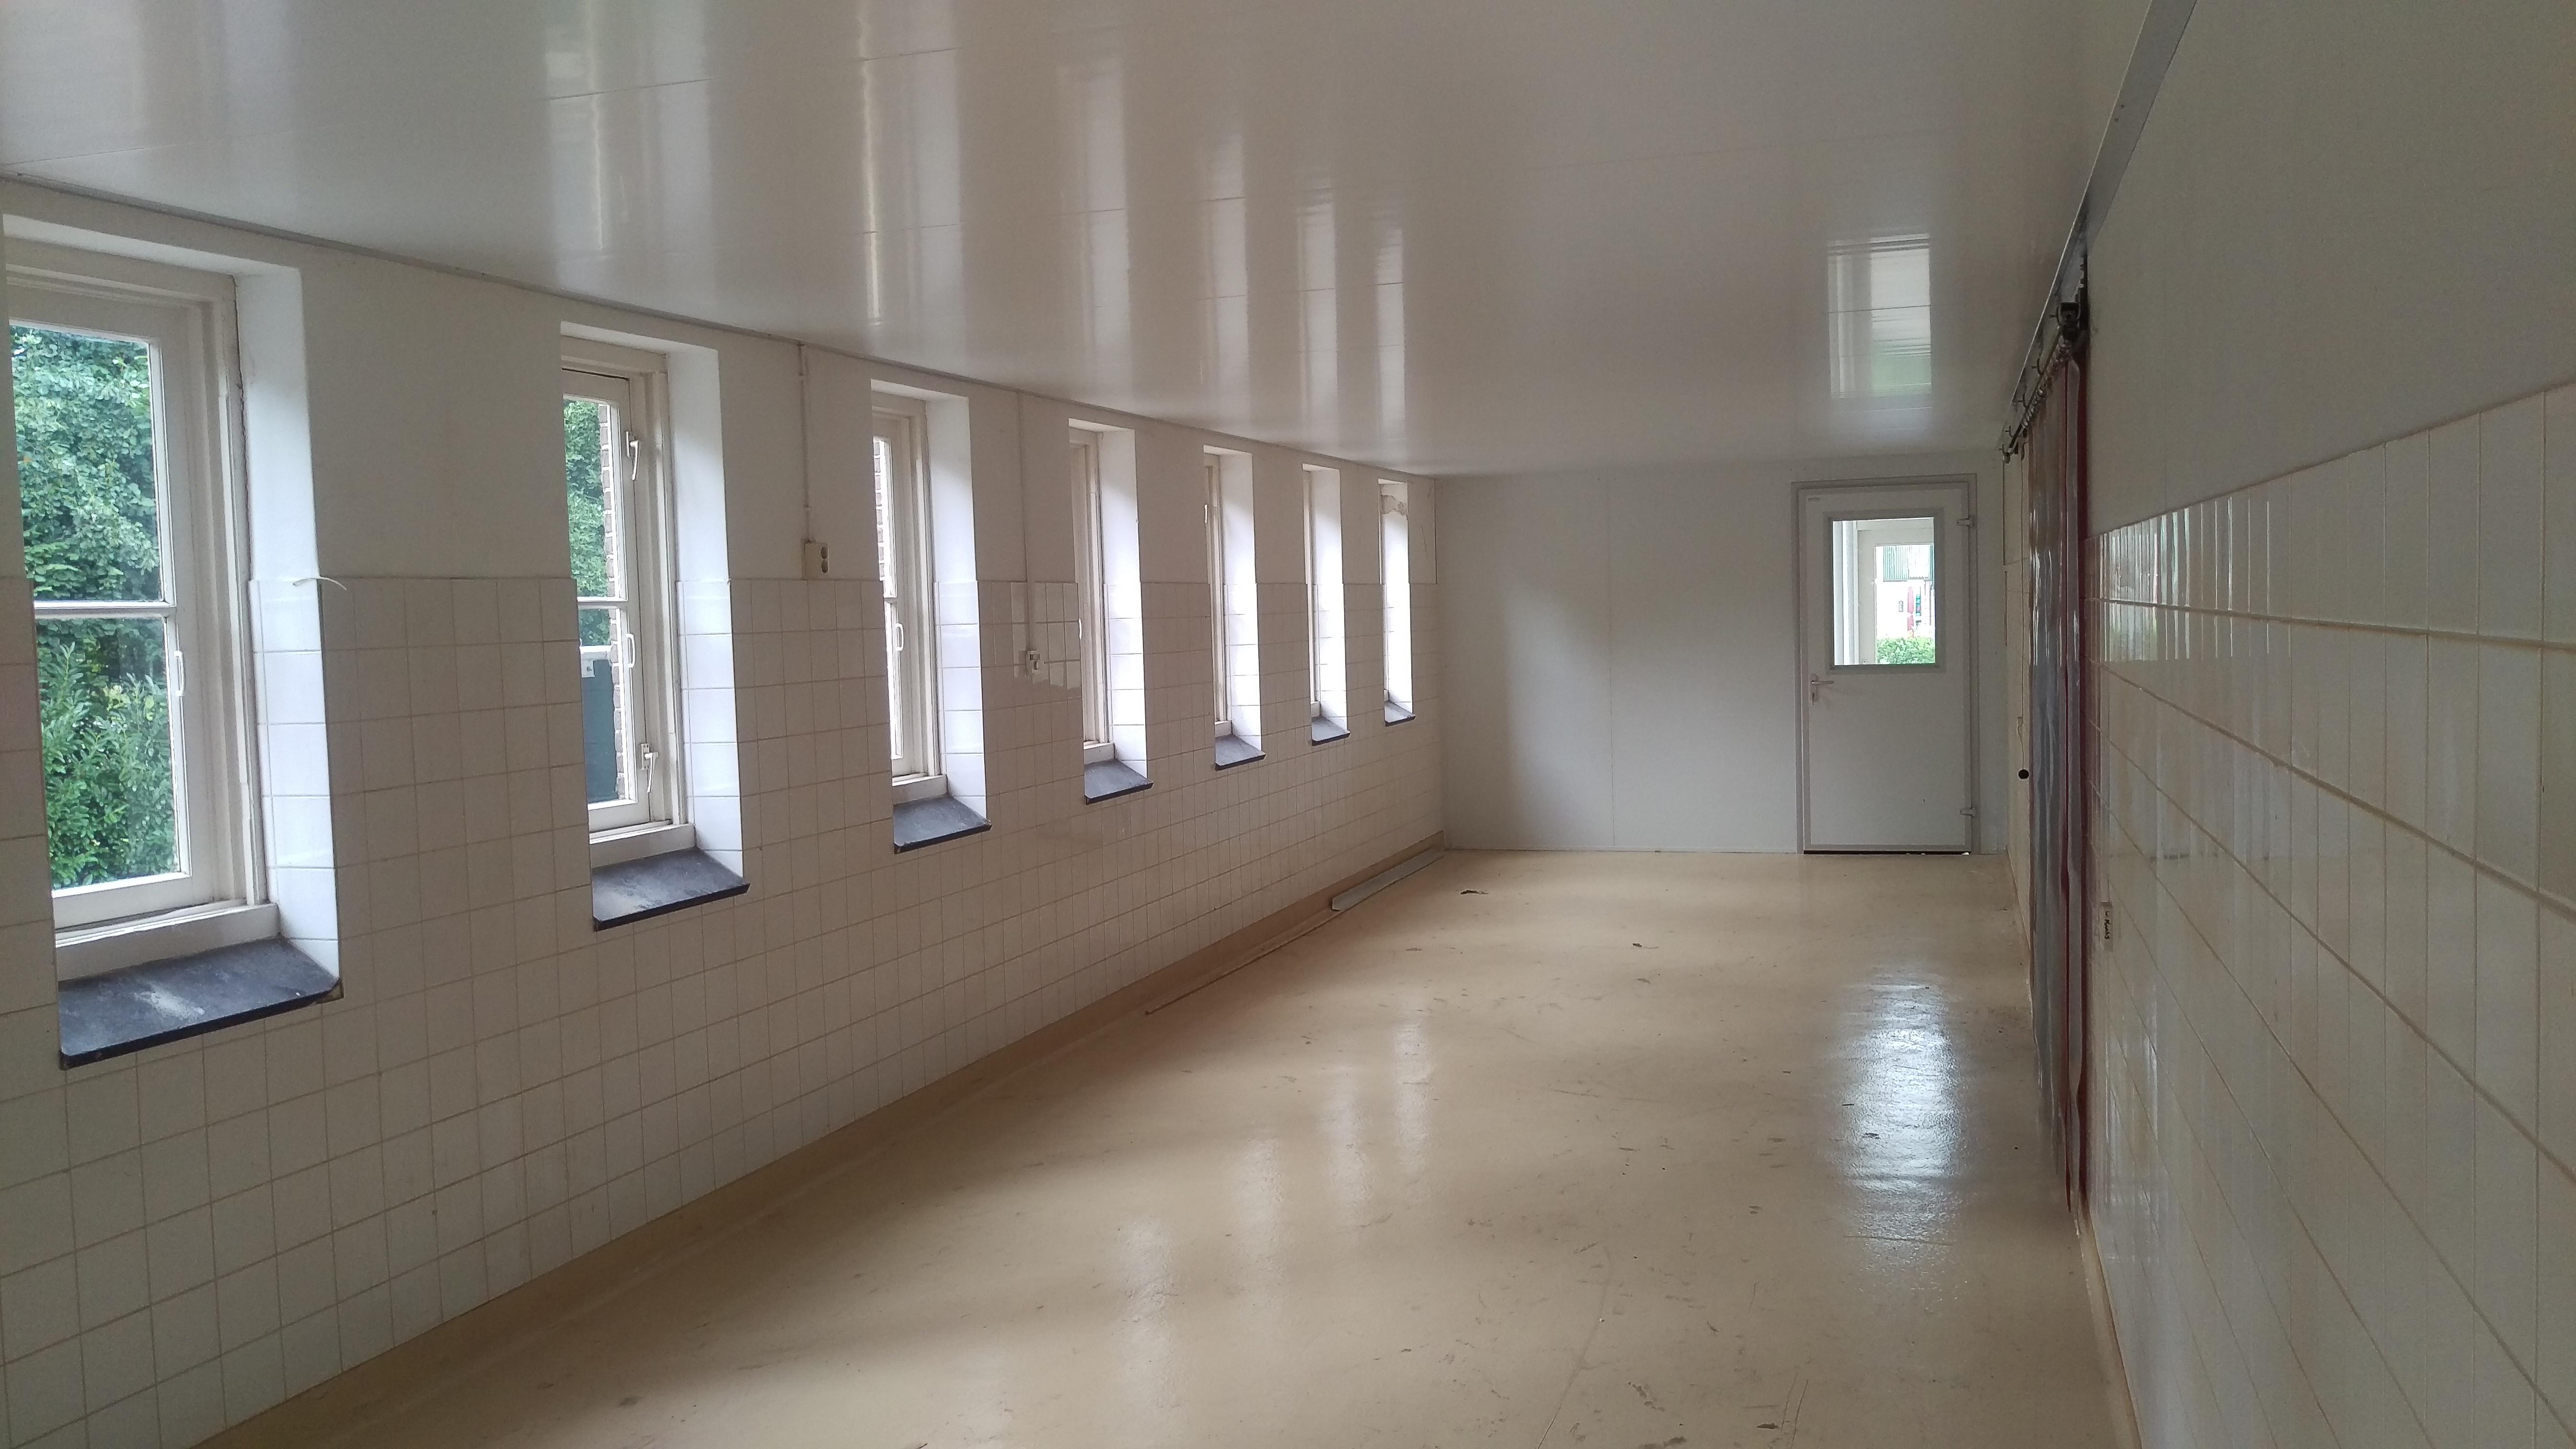 Plafond werkruimte